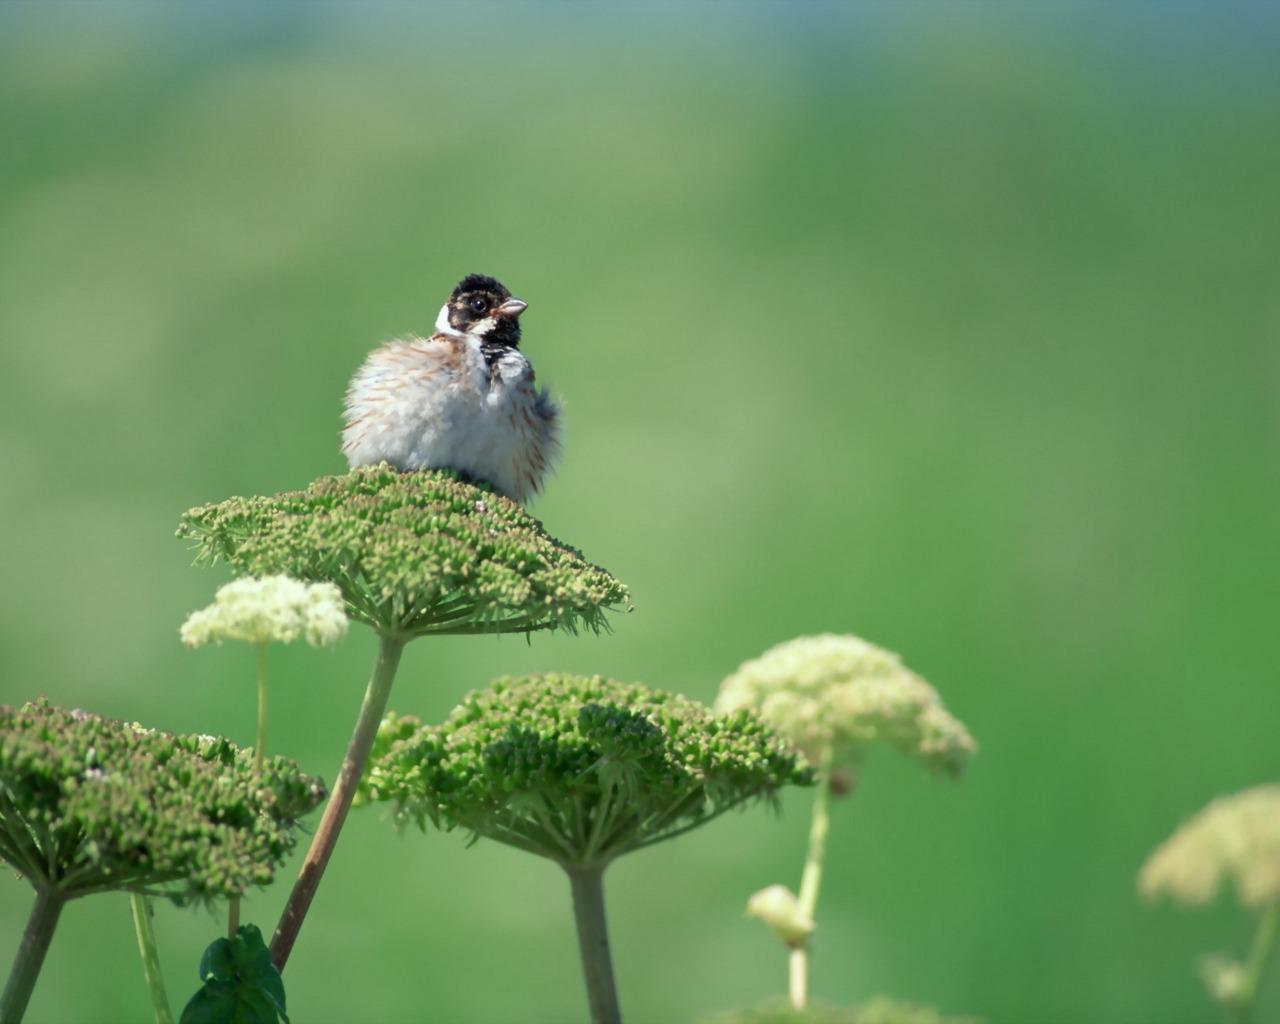 Humming Birds Screensavers download now 1280x1024